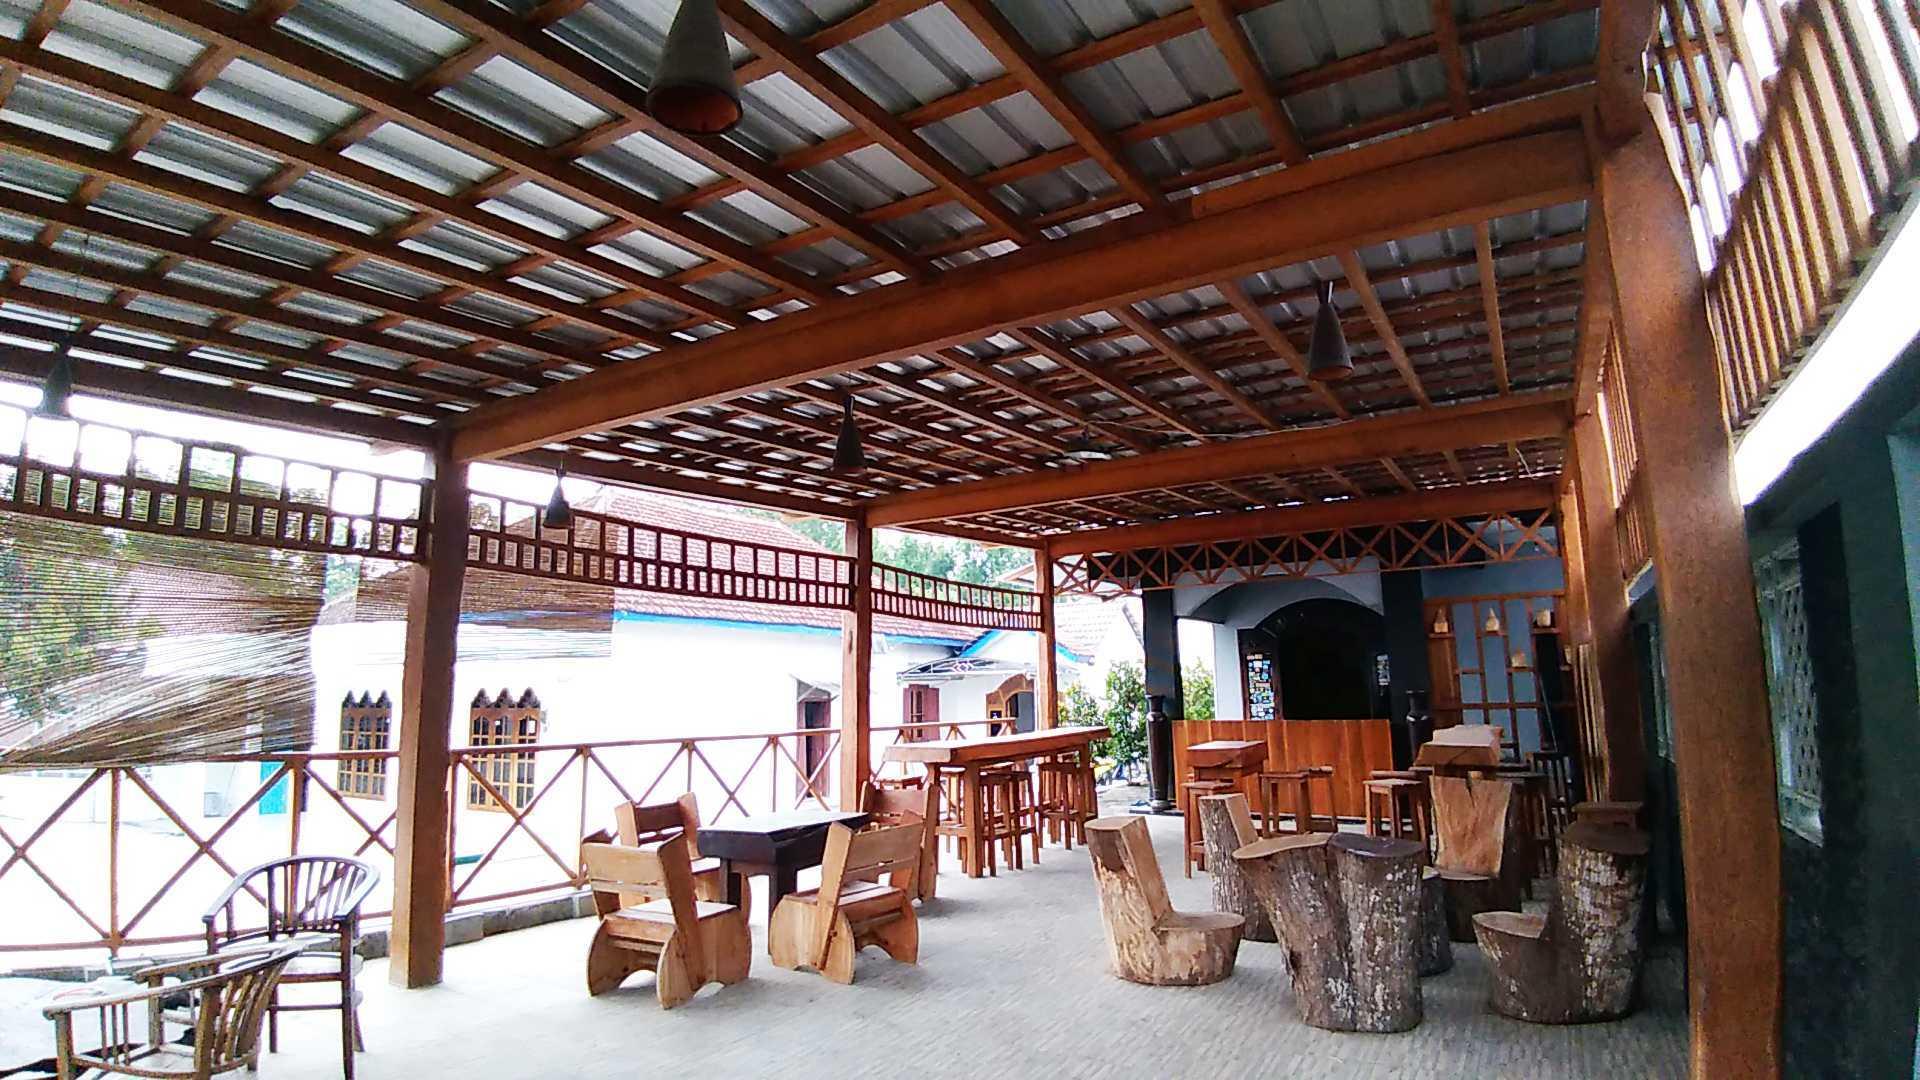 Epicnesia Architect Warung Mbok Ti Malang, Jawa Timur, Indonesia Kediri, Jawa Timur, Indonesia Aditya-Yuni-Prasetya-Bakso-Tiga-Berlian  64300